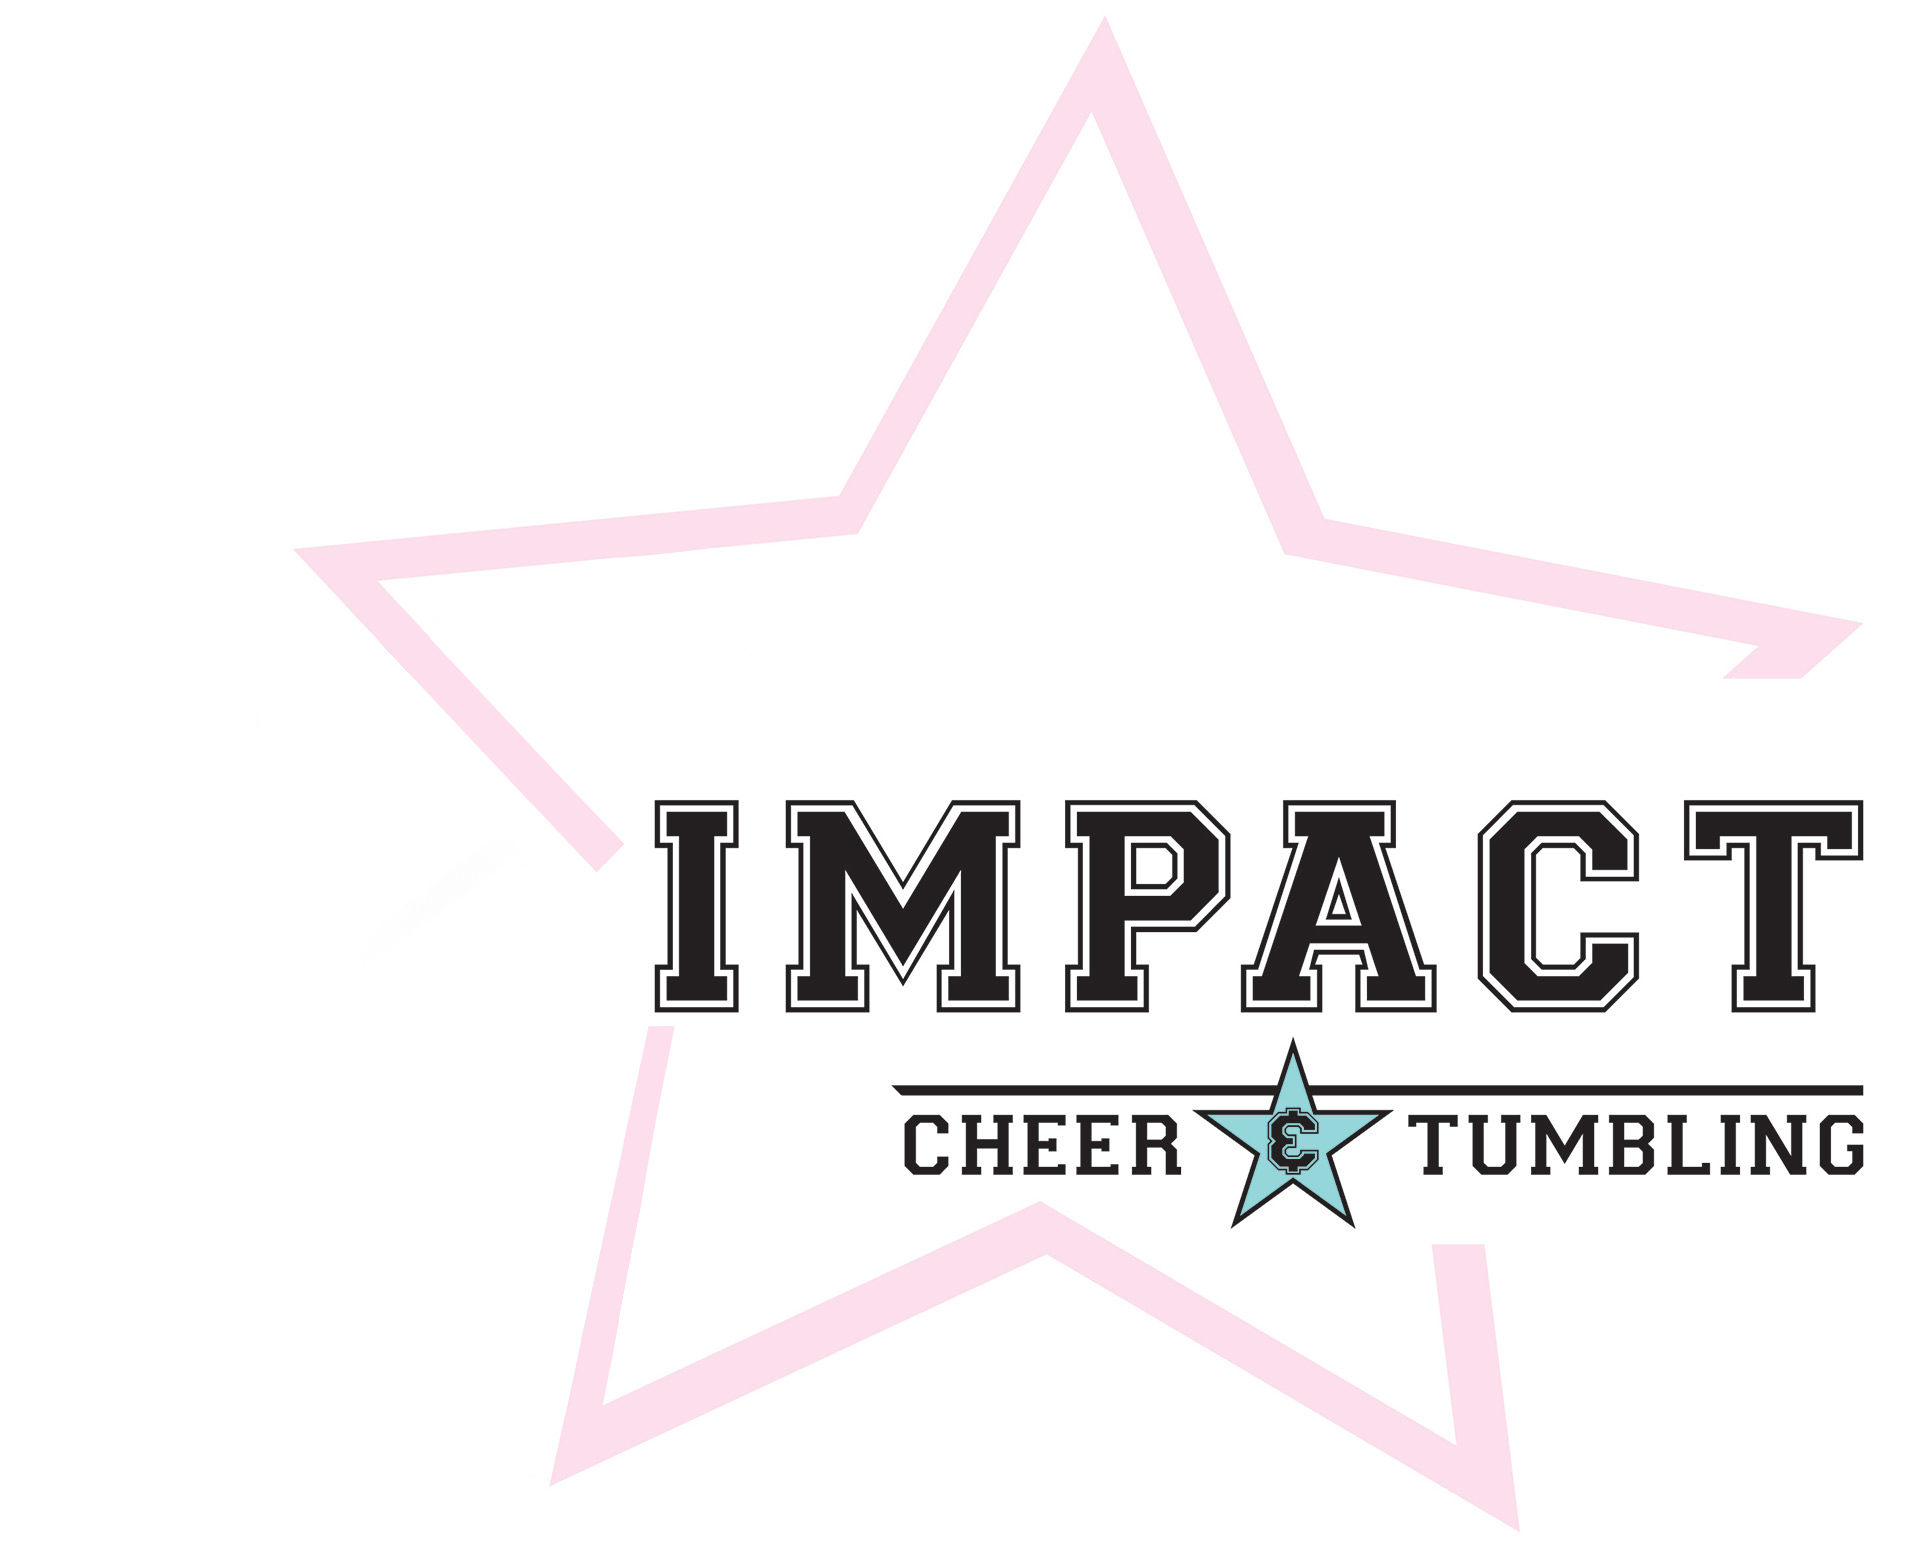 Impact Cheer n Tumbling